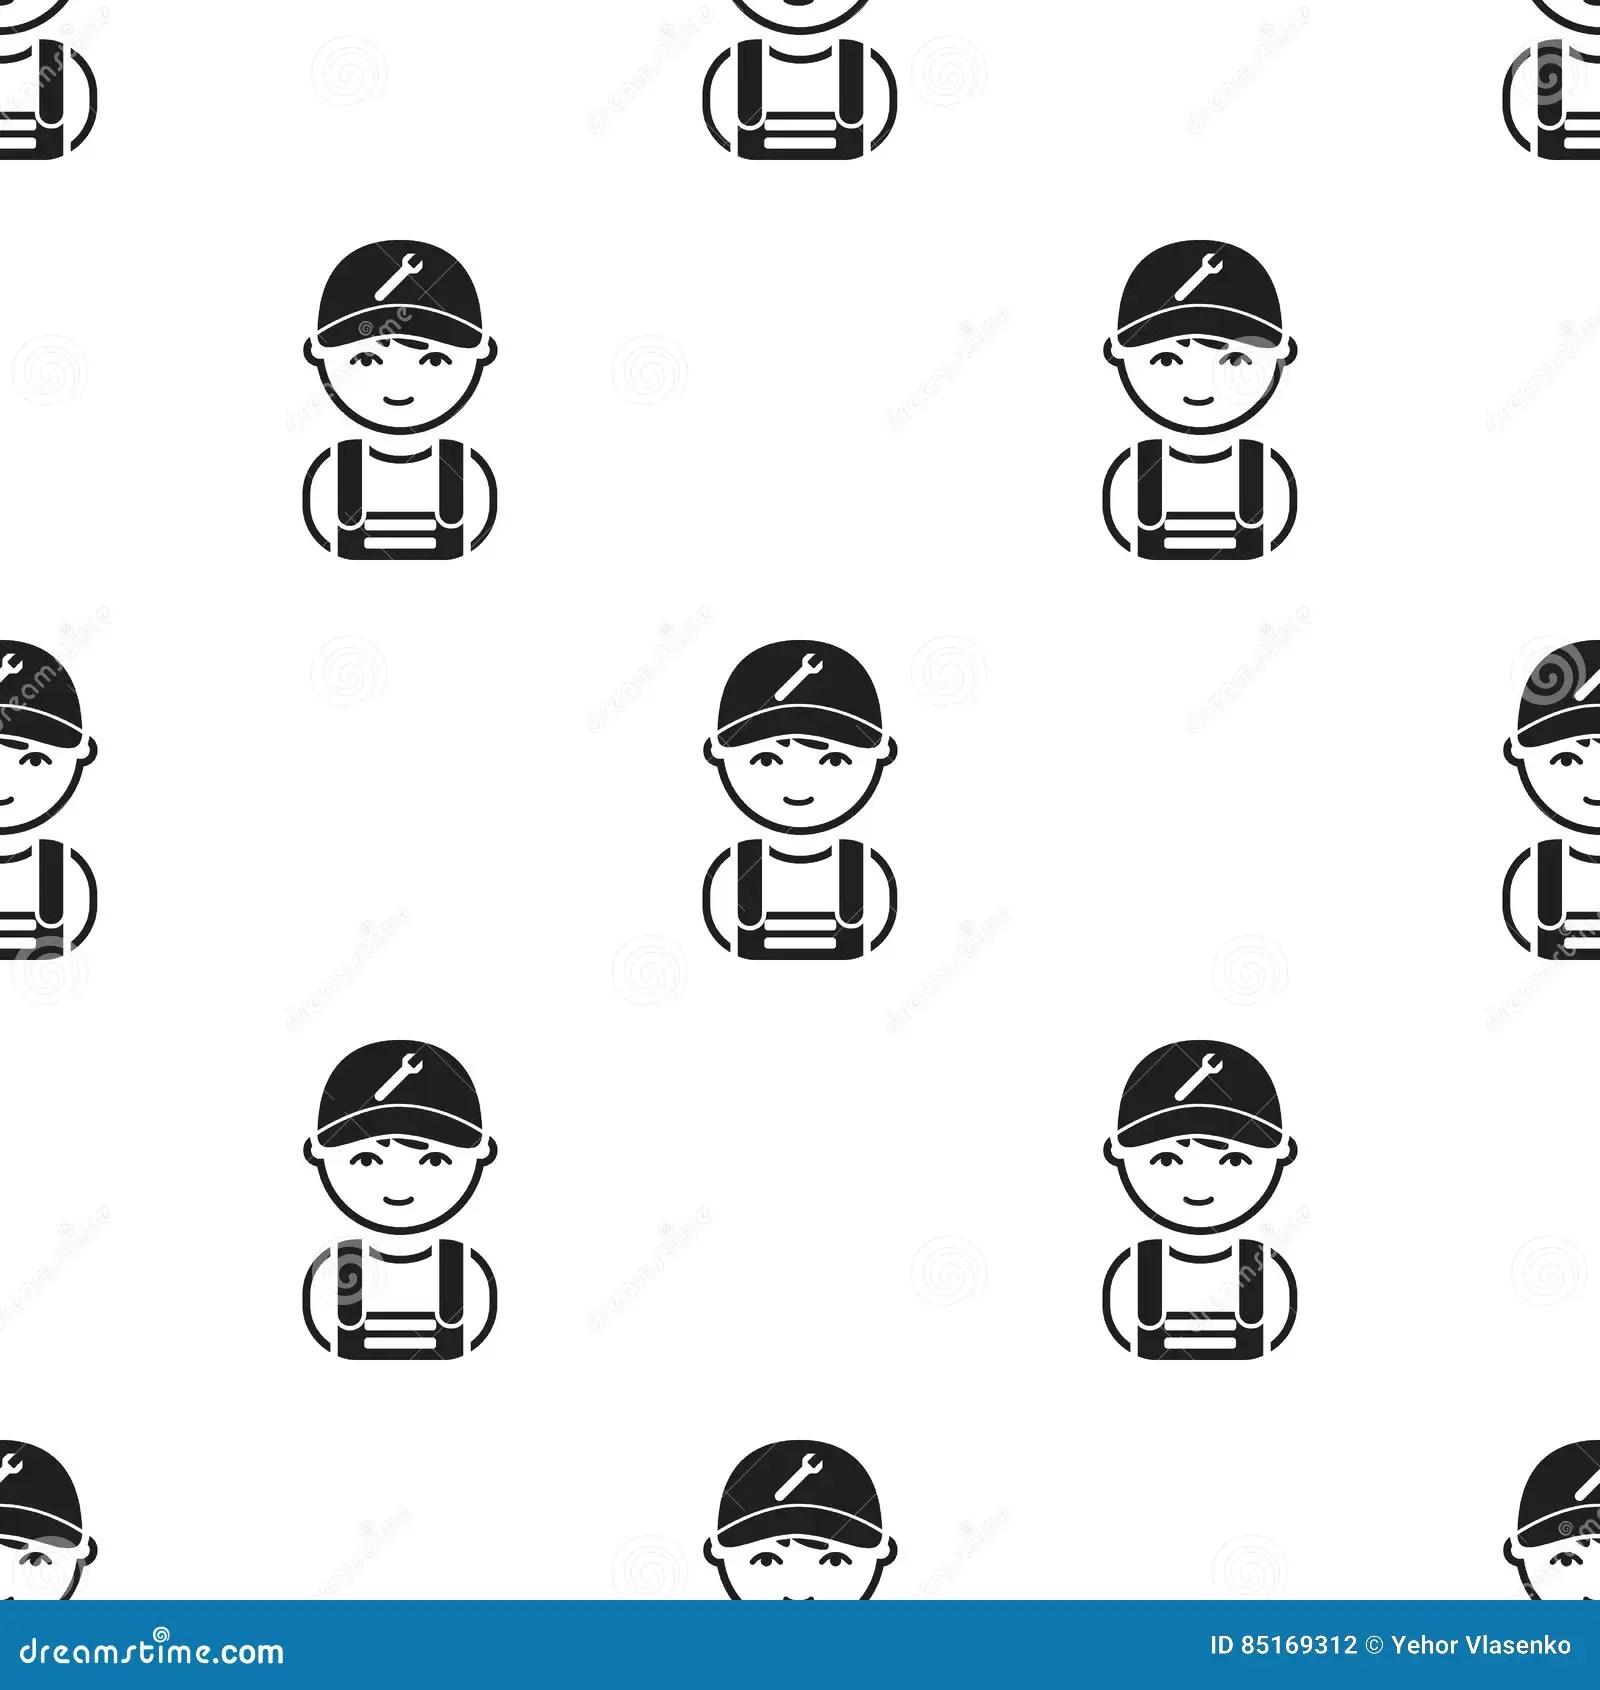 Black Mechanic Or Plumber Handyman Cartoon Vector